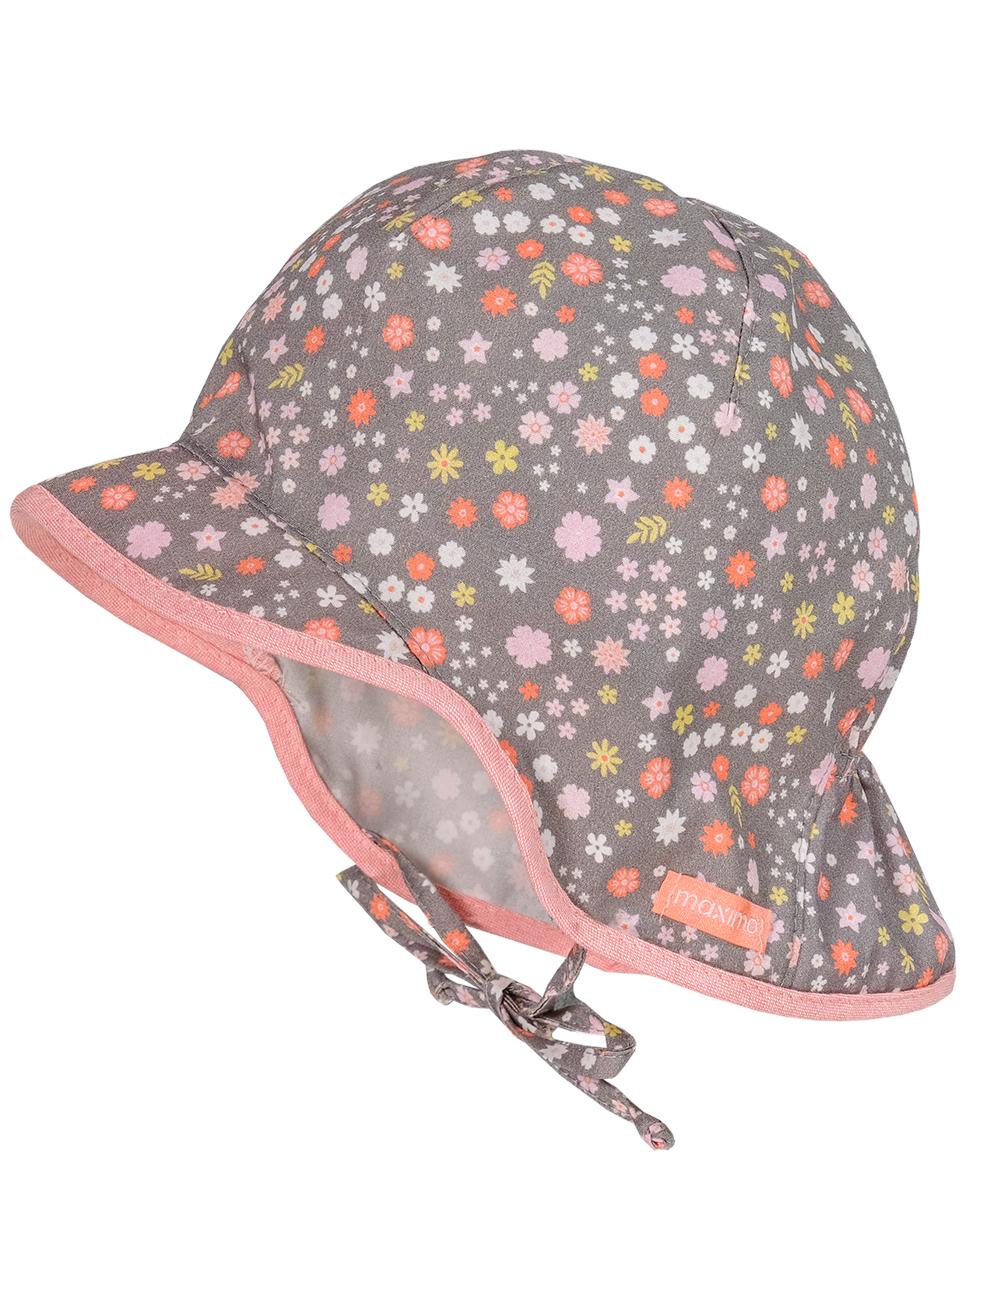 GIRL-Schildmütze 39 Maximo. Farbe: holzkohle-rosa-blümchen, Größe: 39